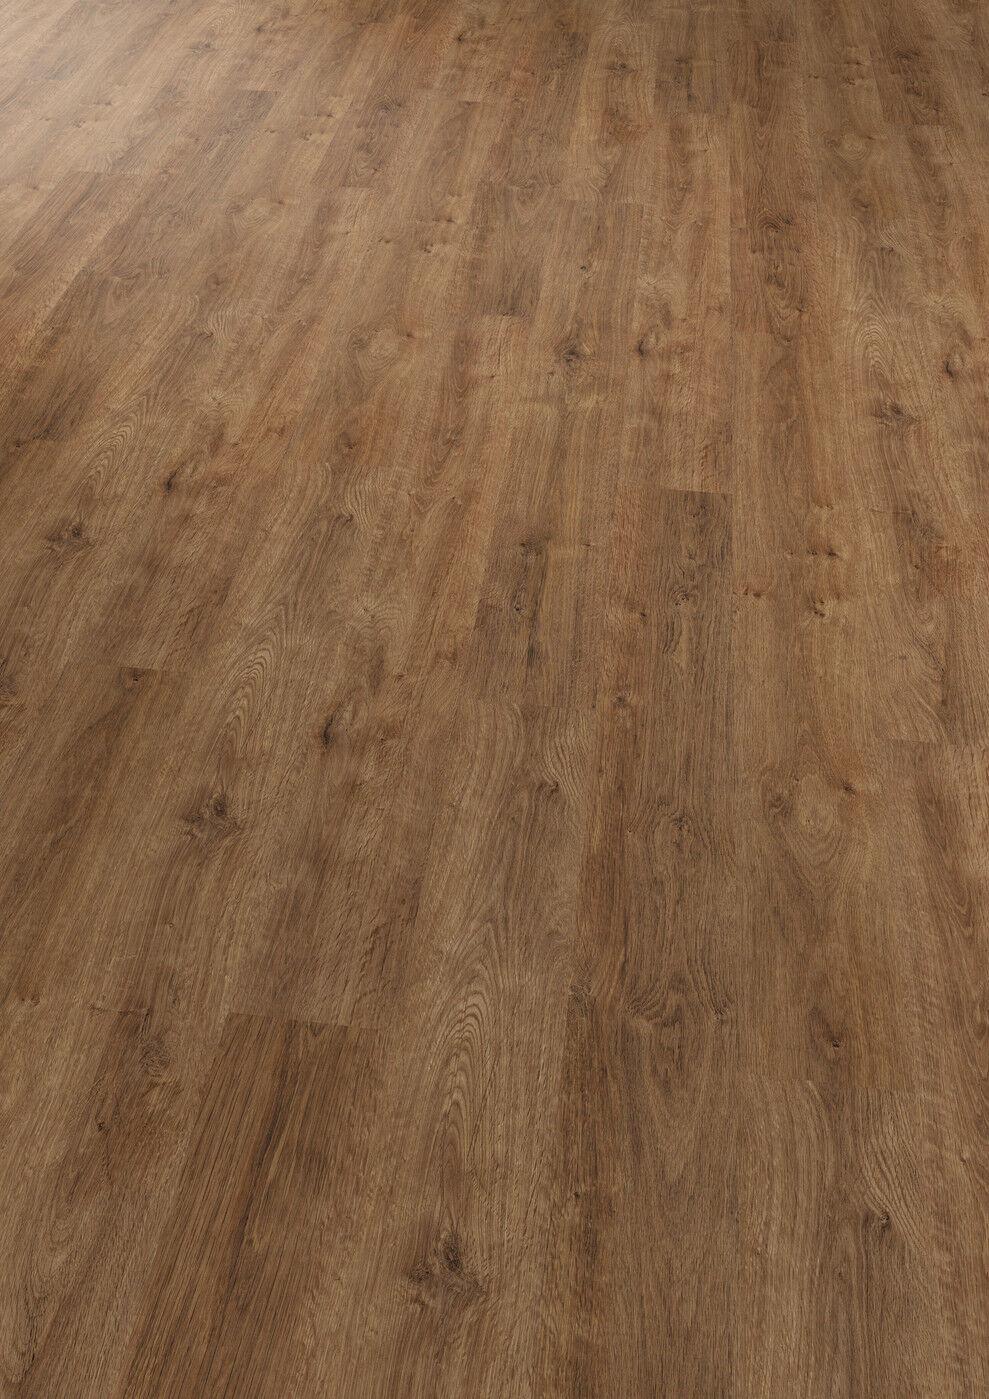 EXPONA Commercial Vinylboden / Designboden 4087 (Amber Classic Oak) 0,55 er